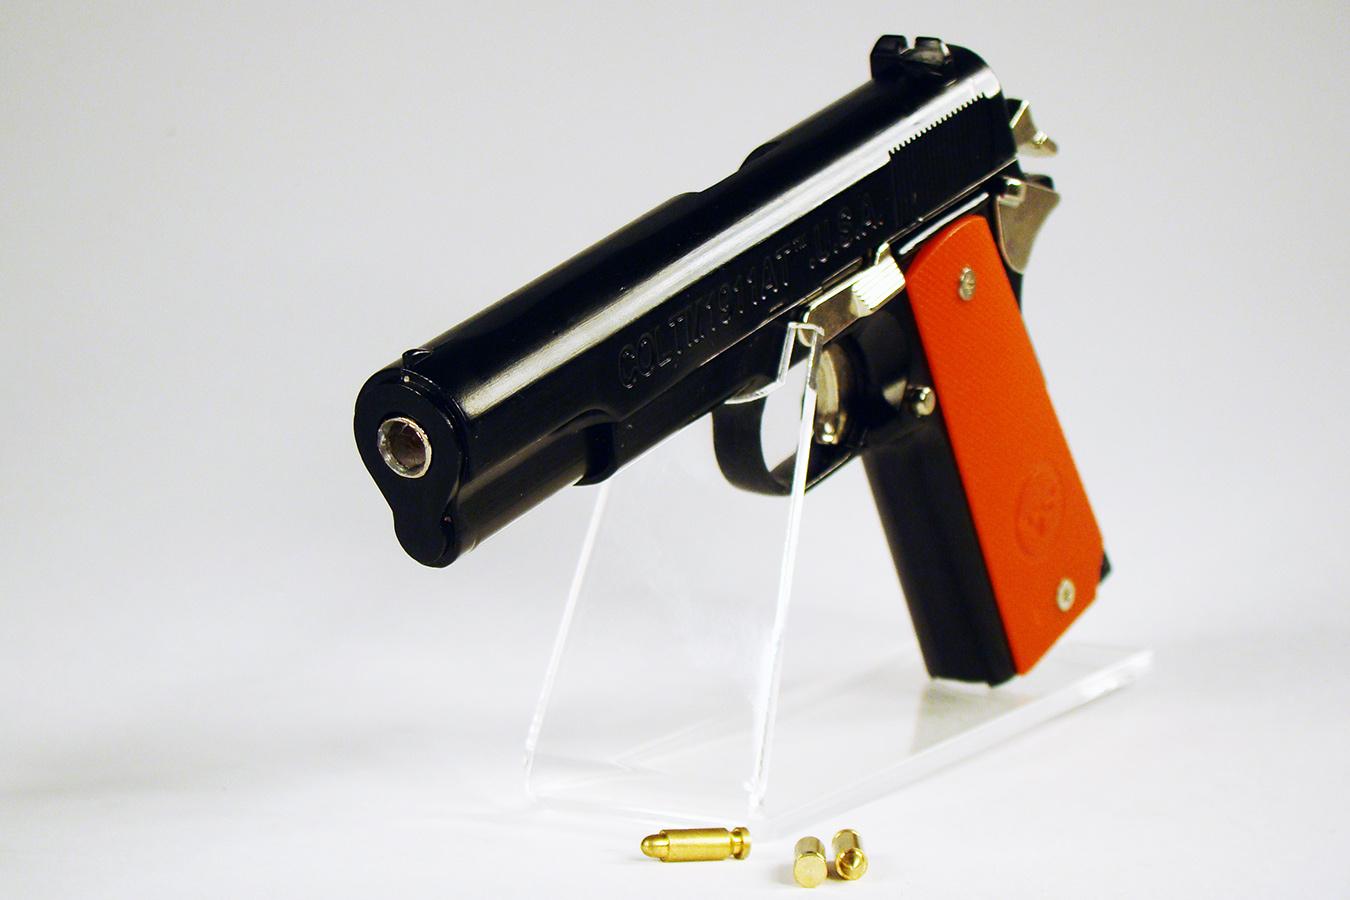 Colt M1911A1 15см изображение 0